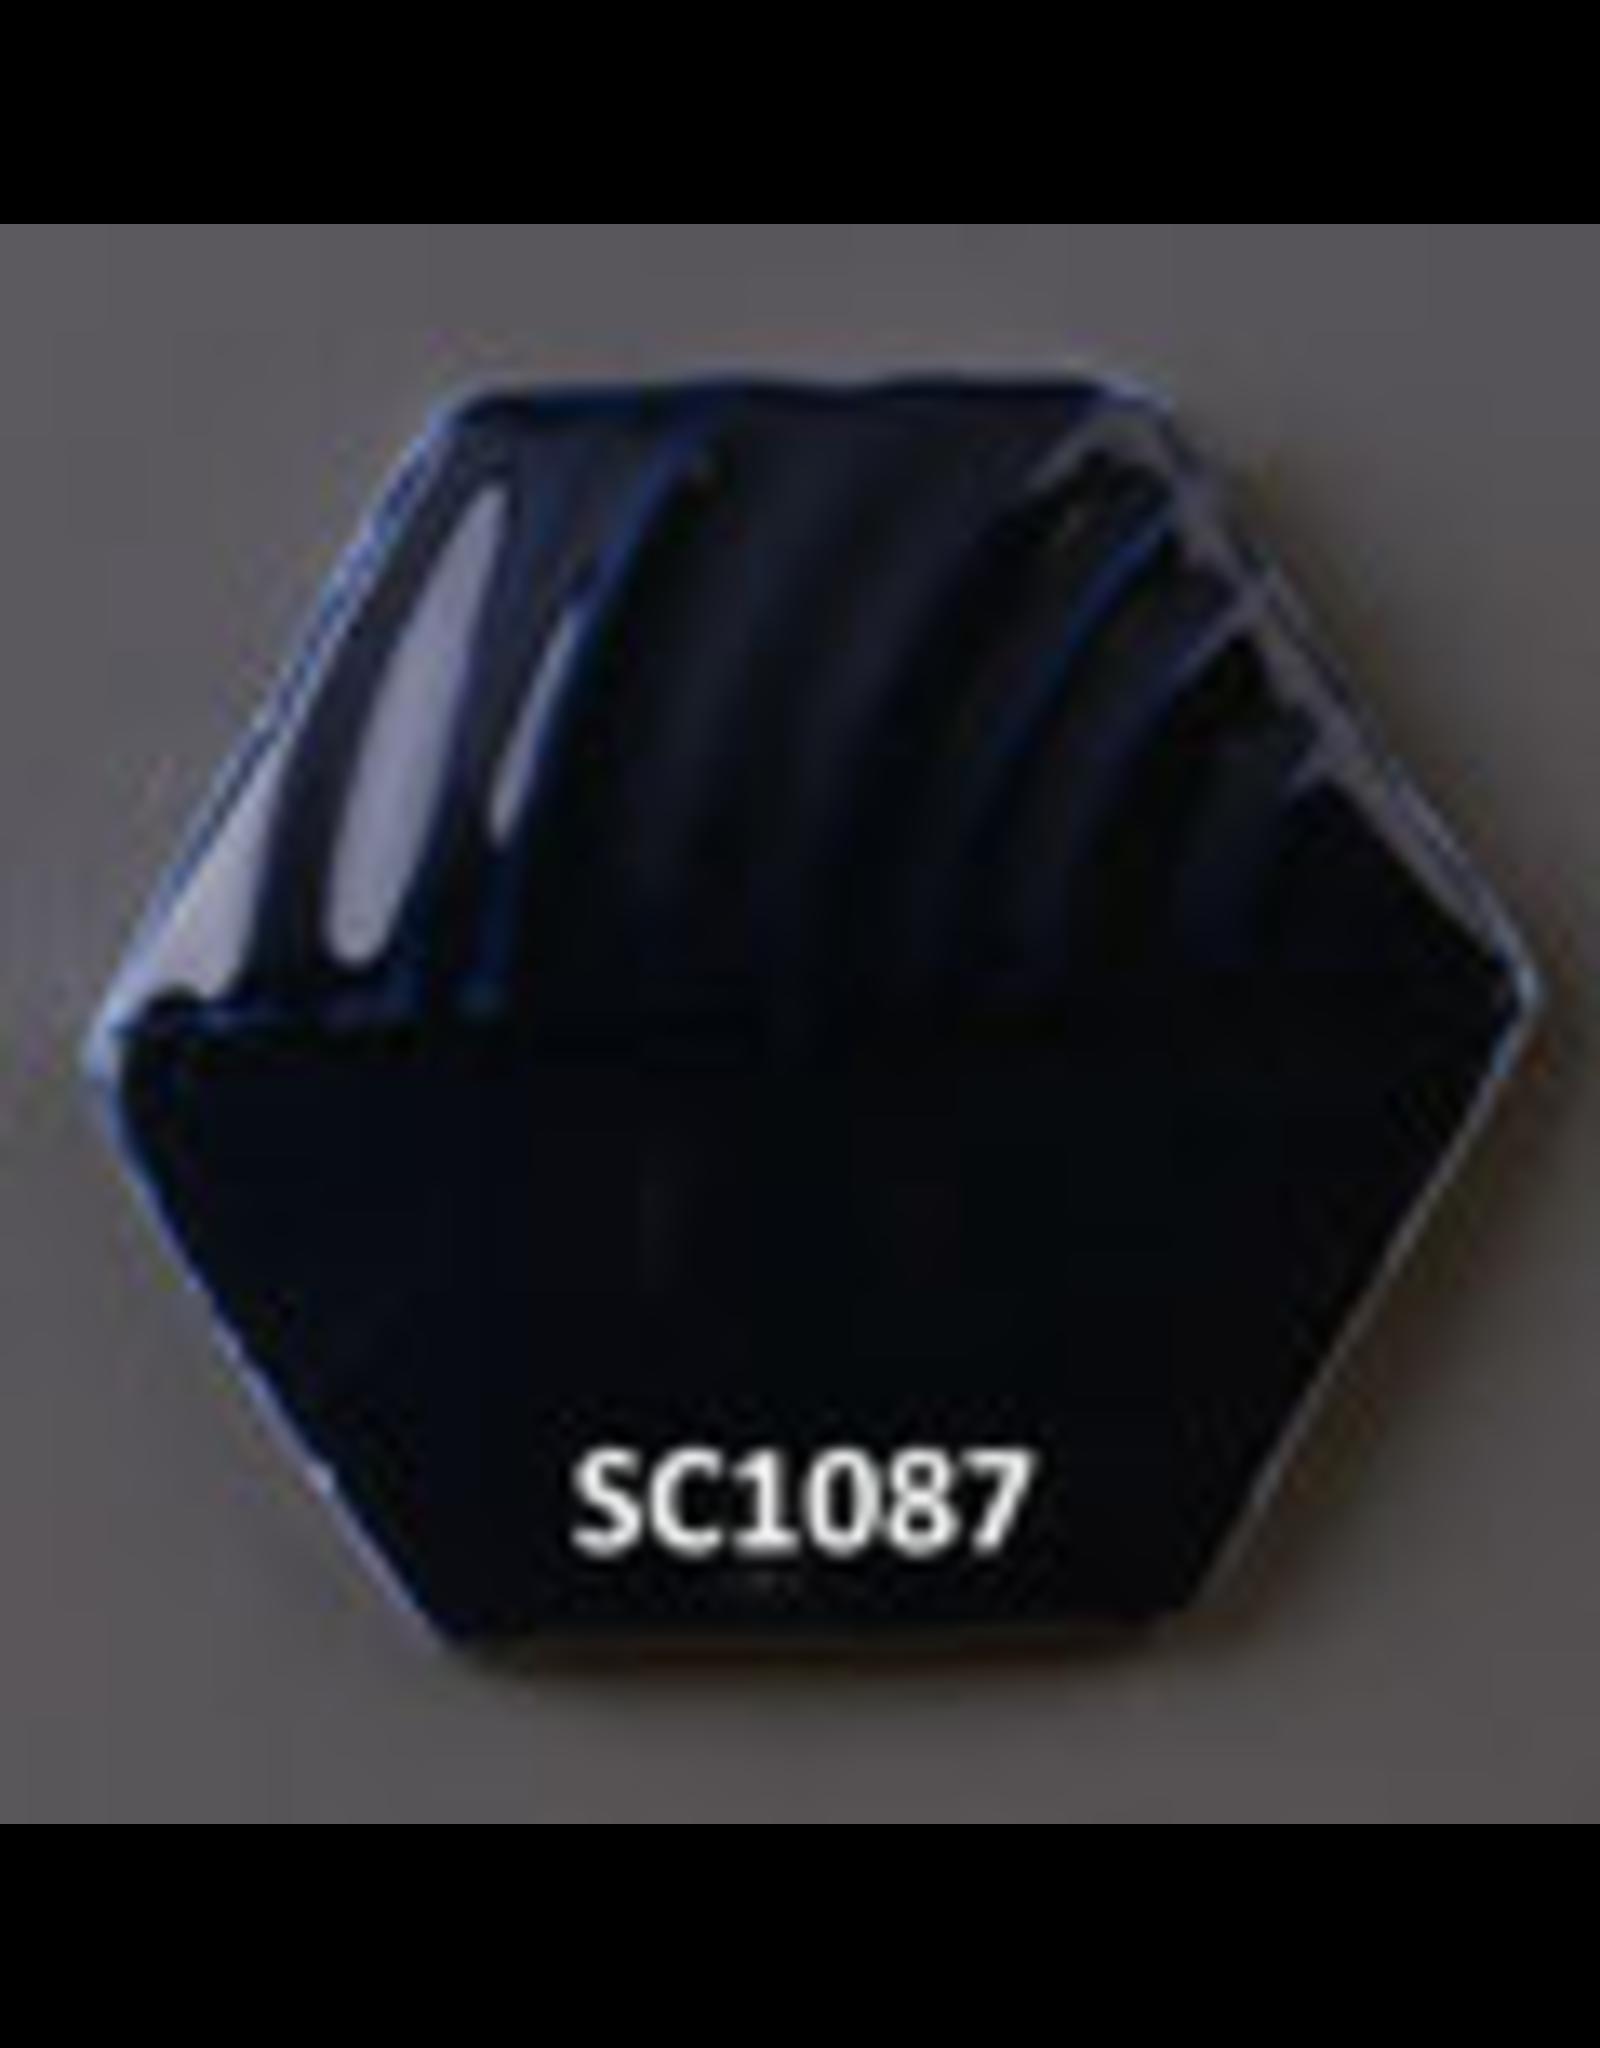 Sneyd Aquamarine (Al,Cr,Co,Zn) Glaze Stain